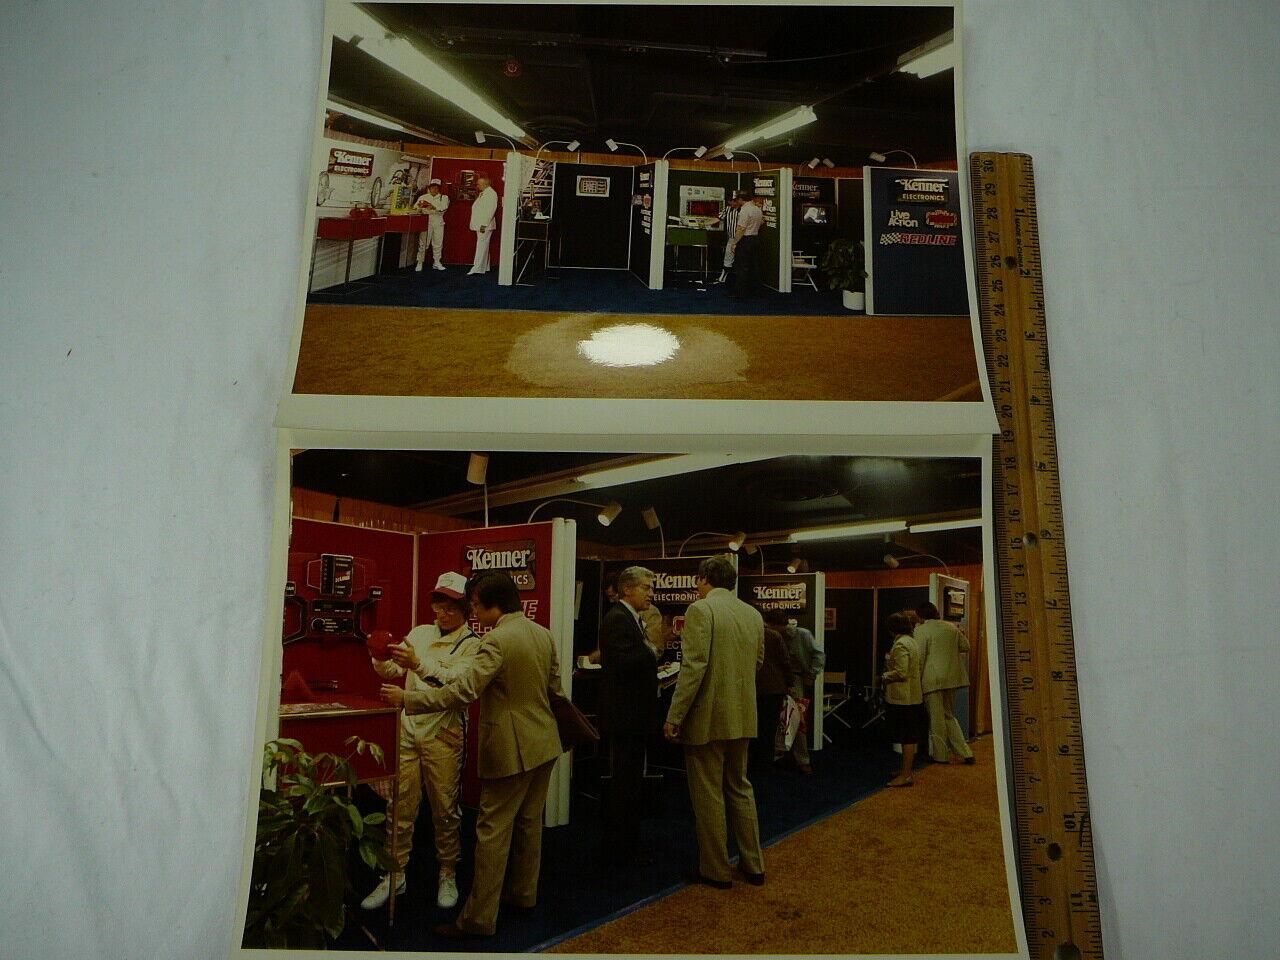 Kenner estrella guerras  giocattolo Fair 1980 Internal azienda Pcalienteo Set Rare Vintage Original  prima qualità ai consumatori